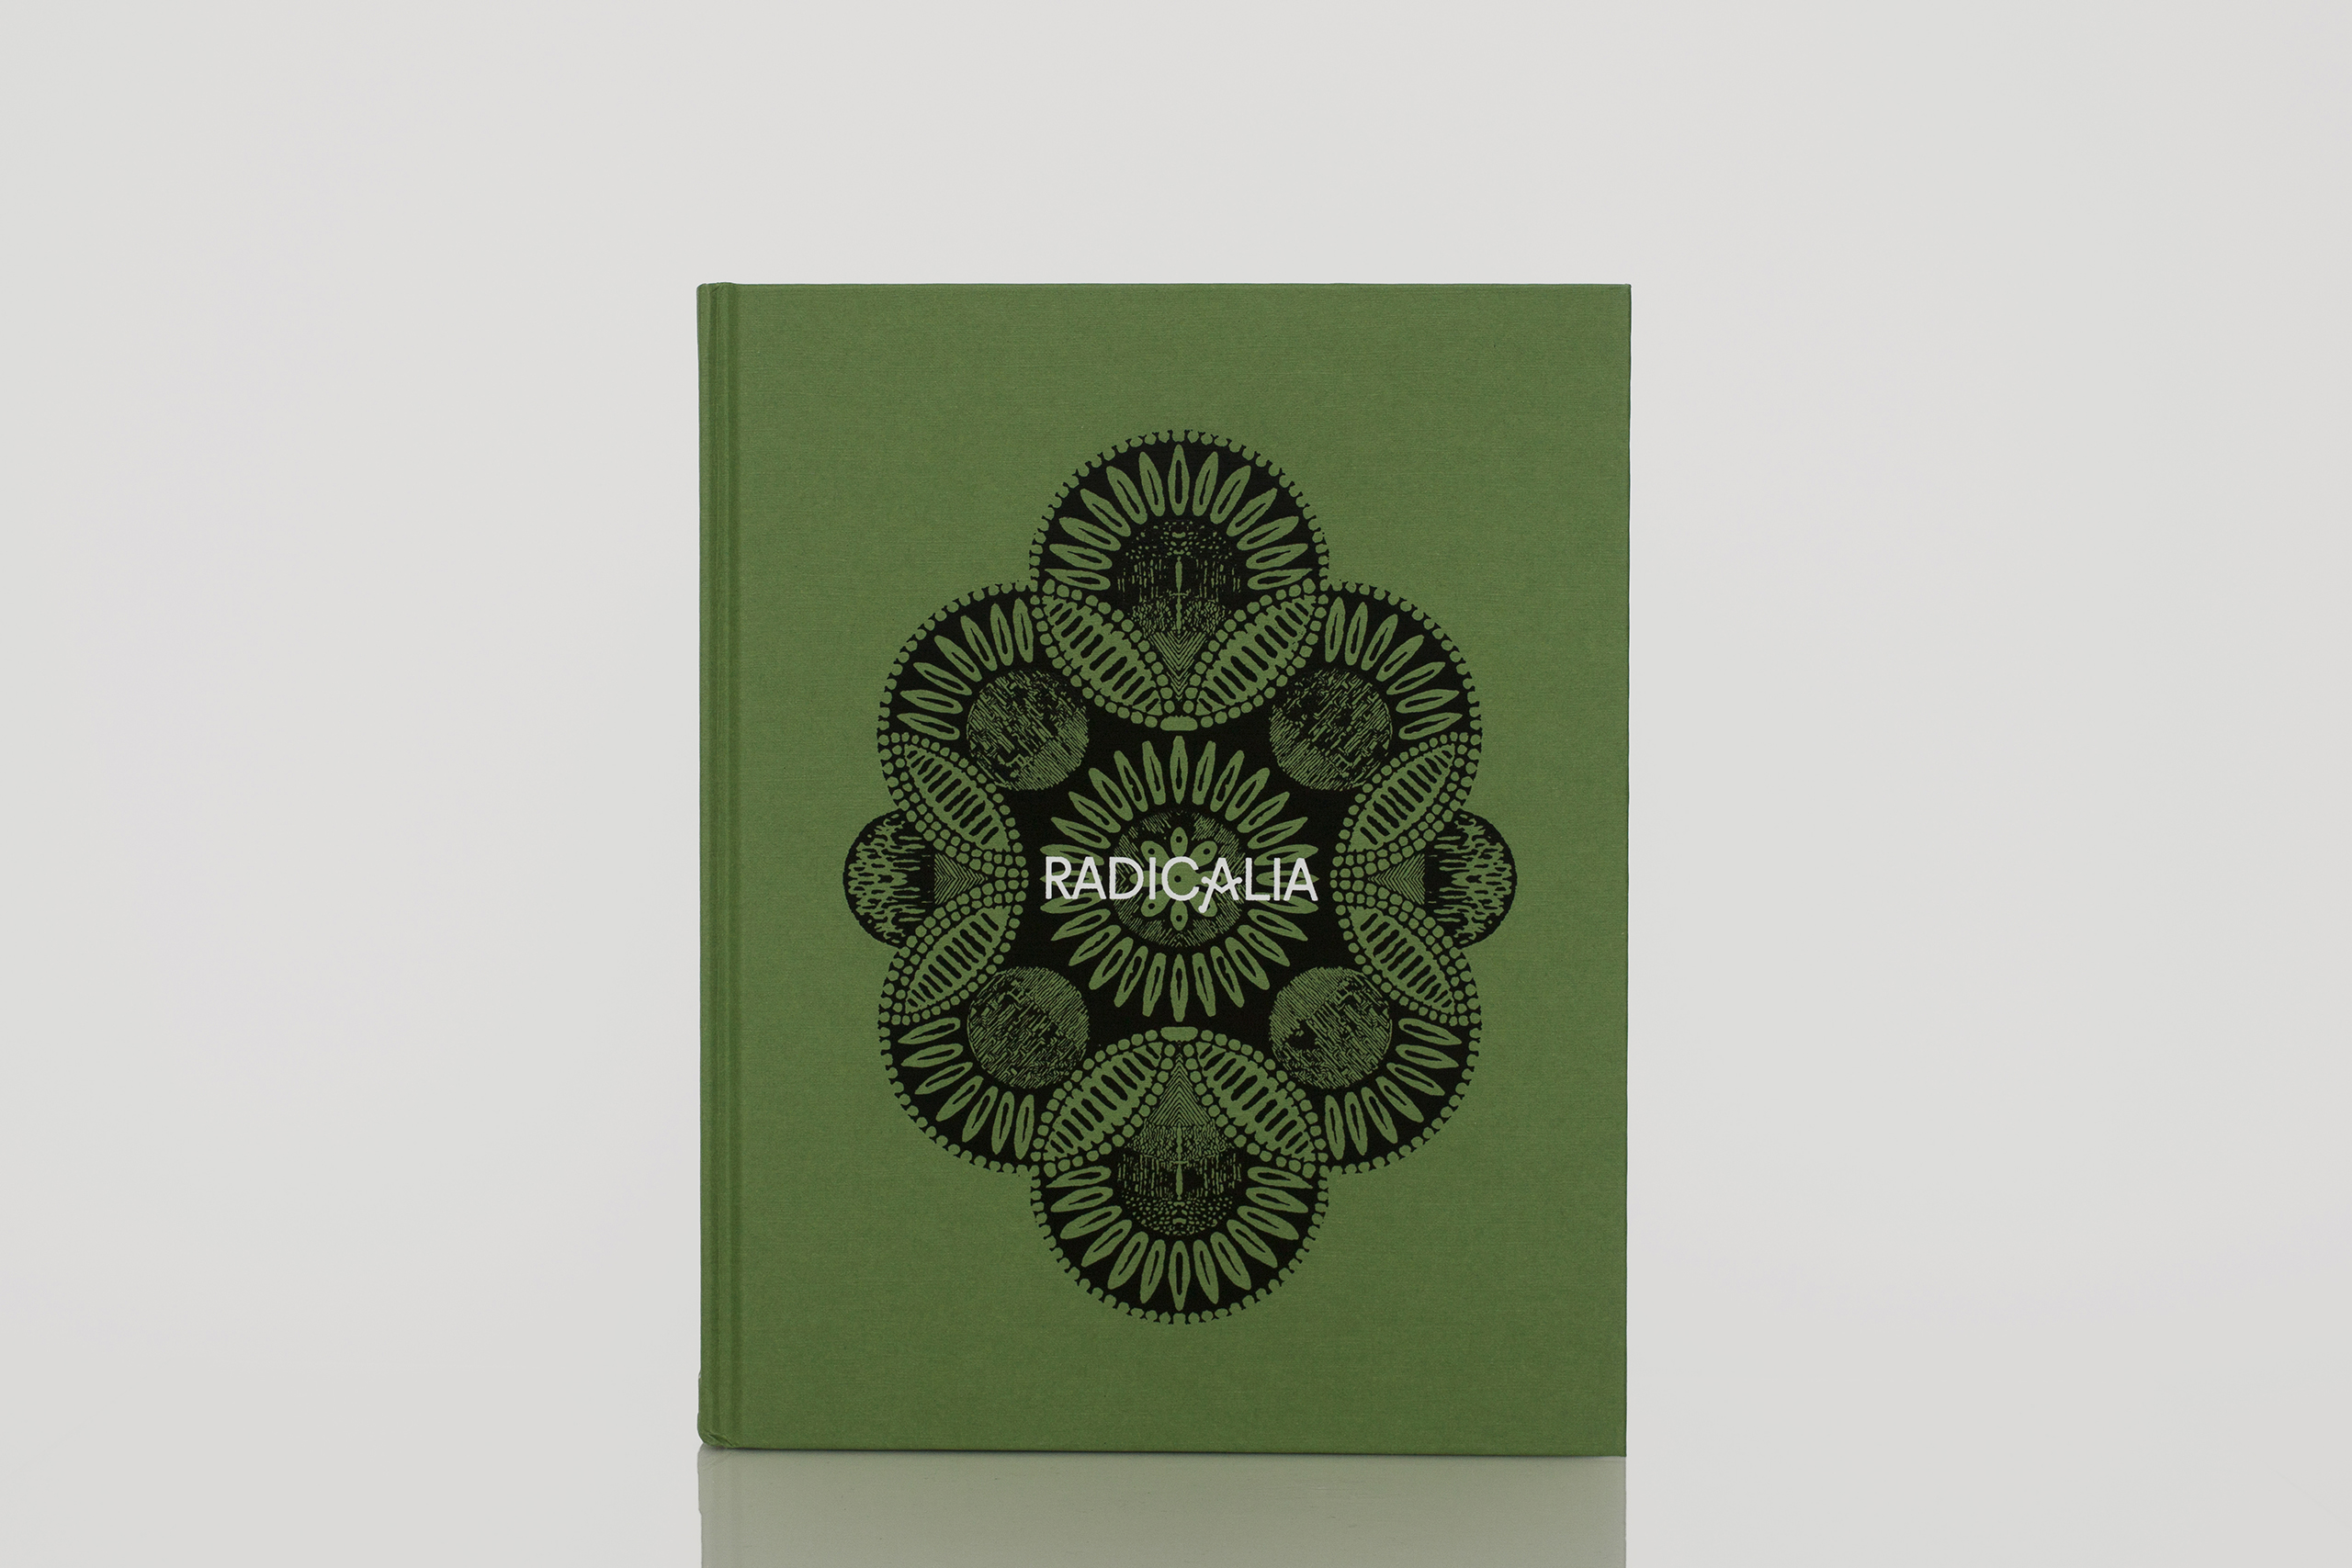 Radicalia by Piero MartinelloSelf Published